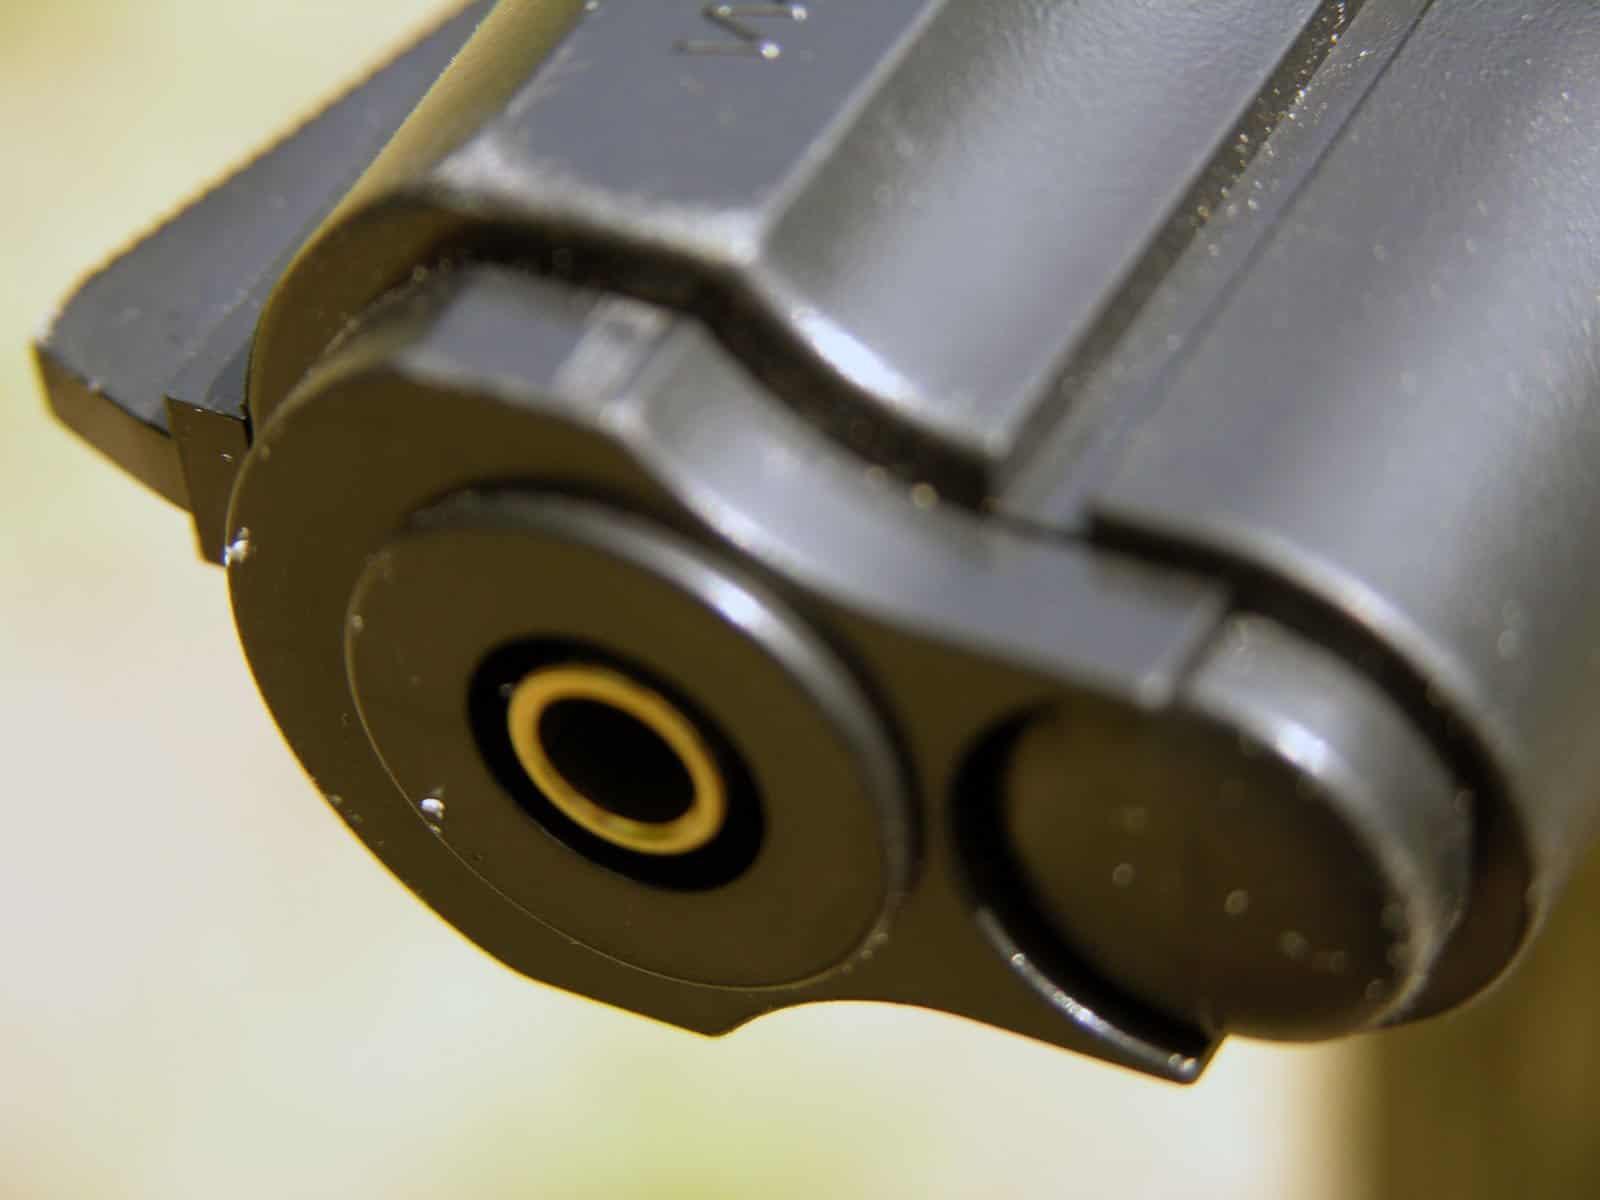 Gun Nose - Believe it Or Not, Pellet and BB Guns Can Kill